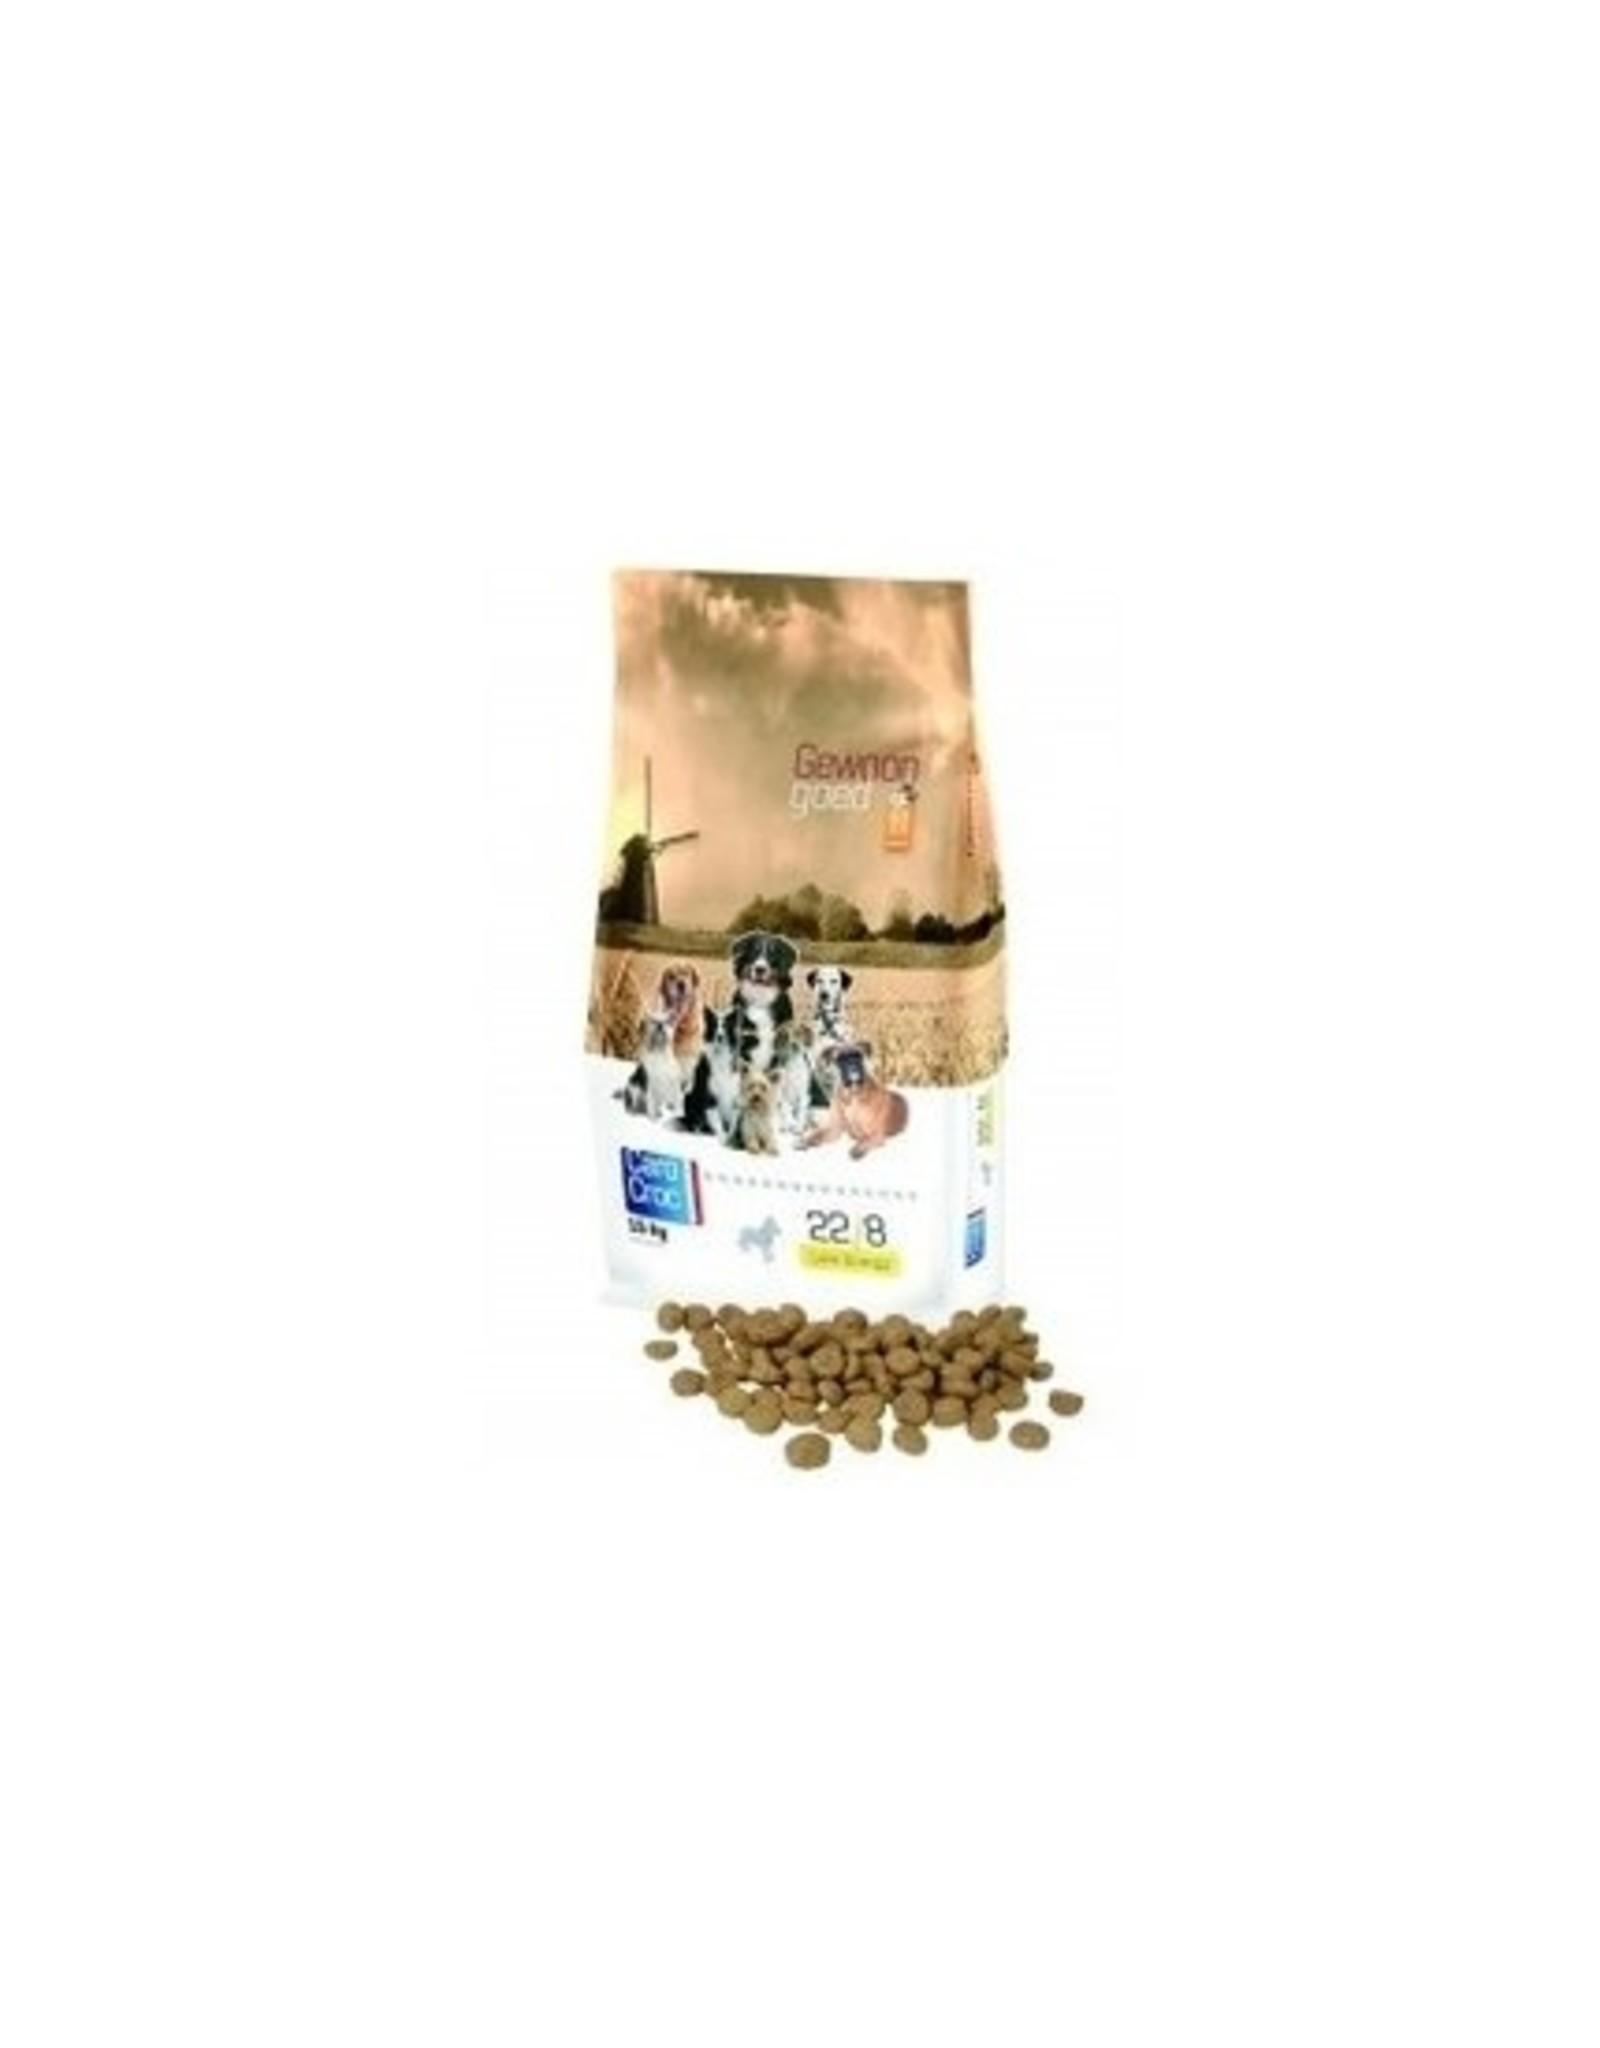 Sanimed Sanimed Carocroc 22/8 Canine Low Energy Chk Rice 15kg